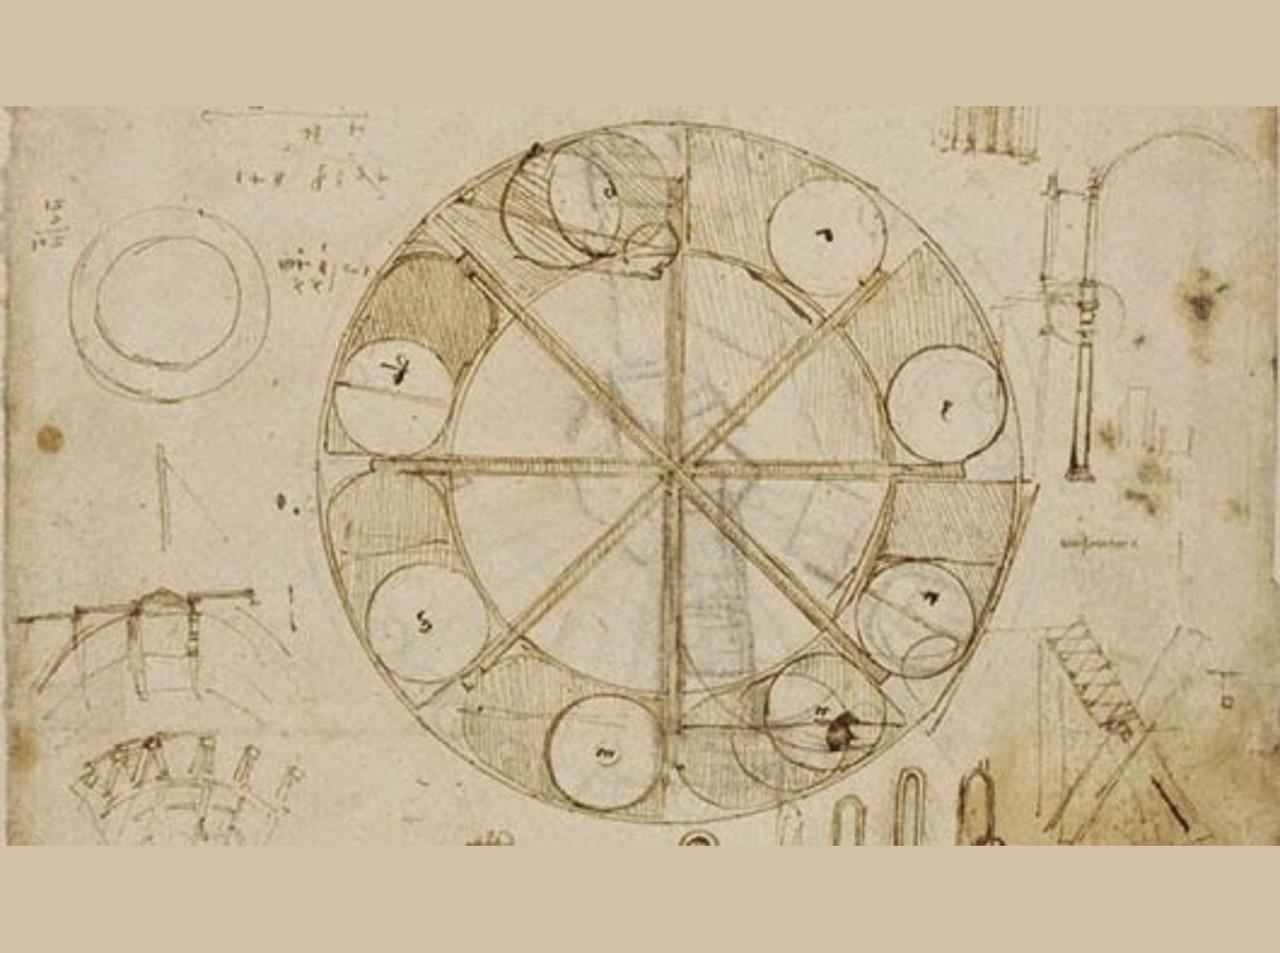 Perpetuum Modile - Da Vinci.jpeg